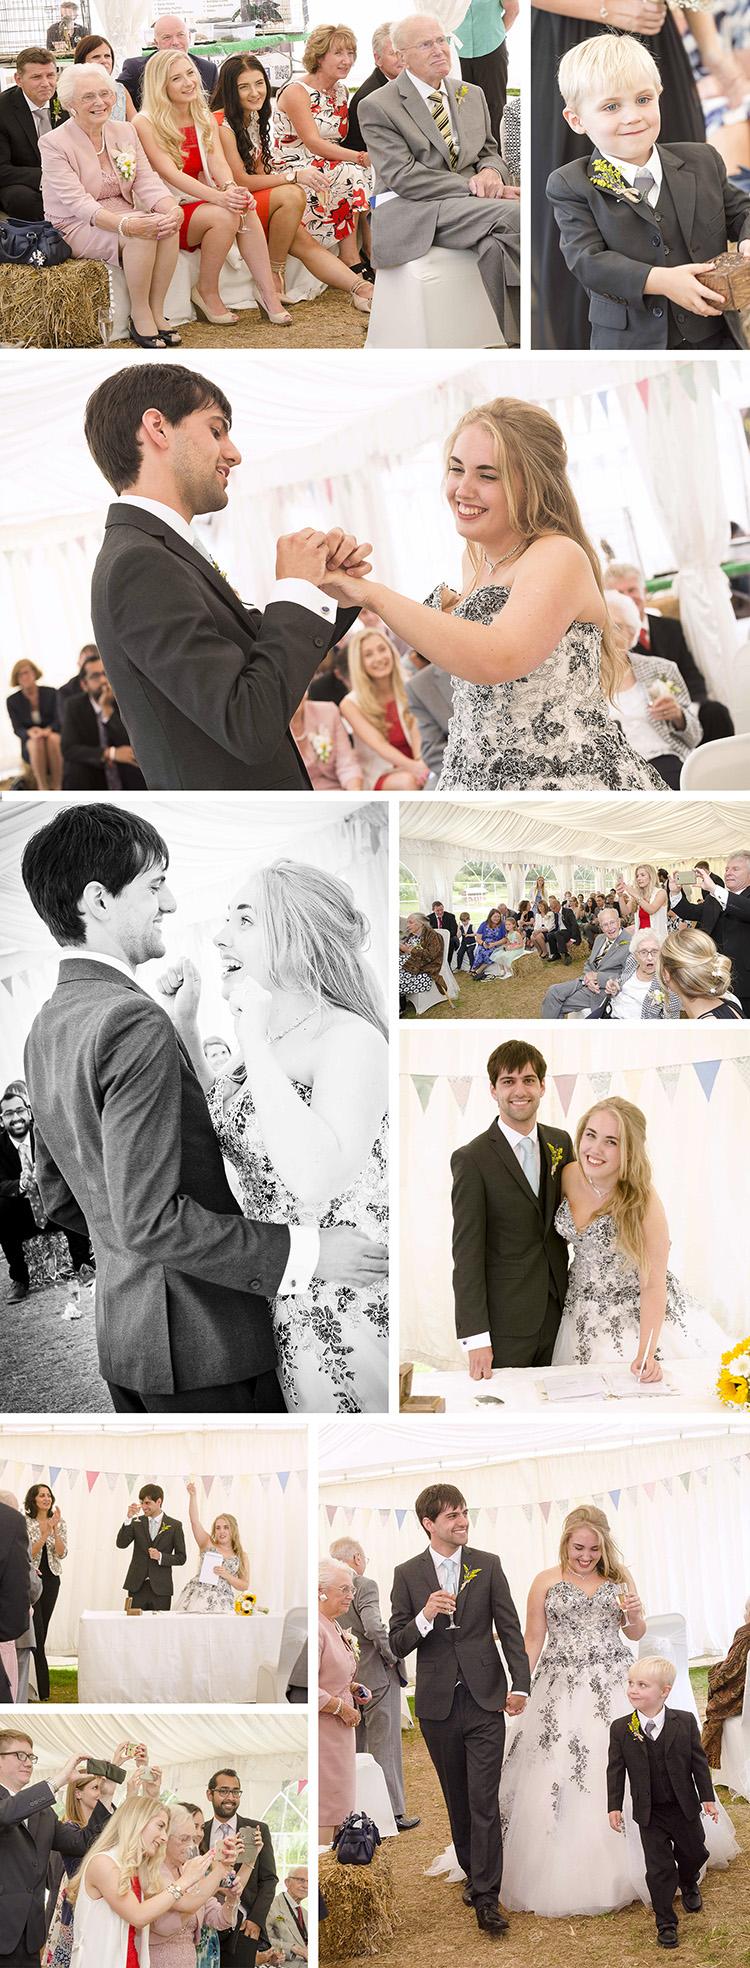 marque wedding photography